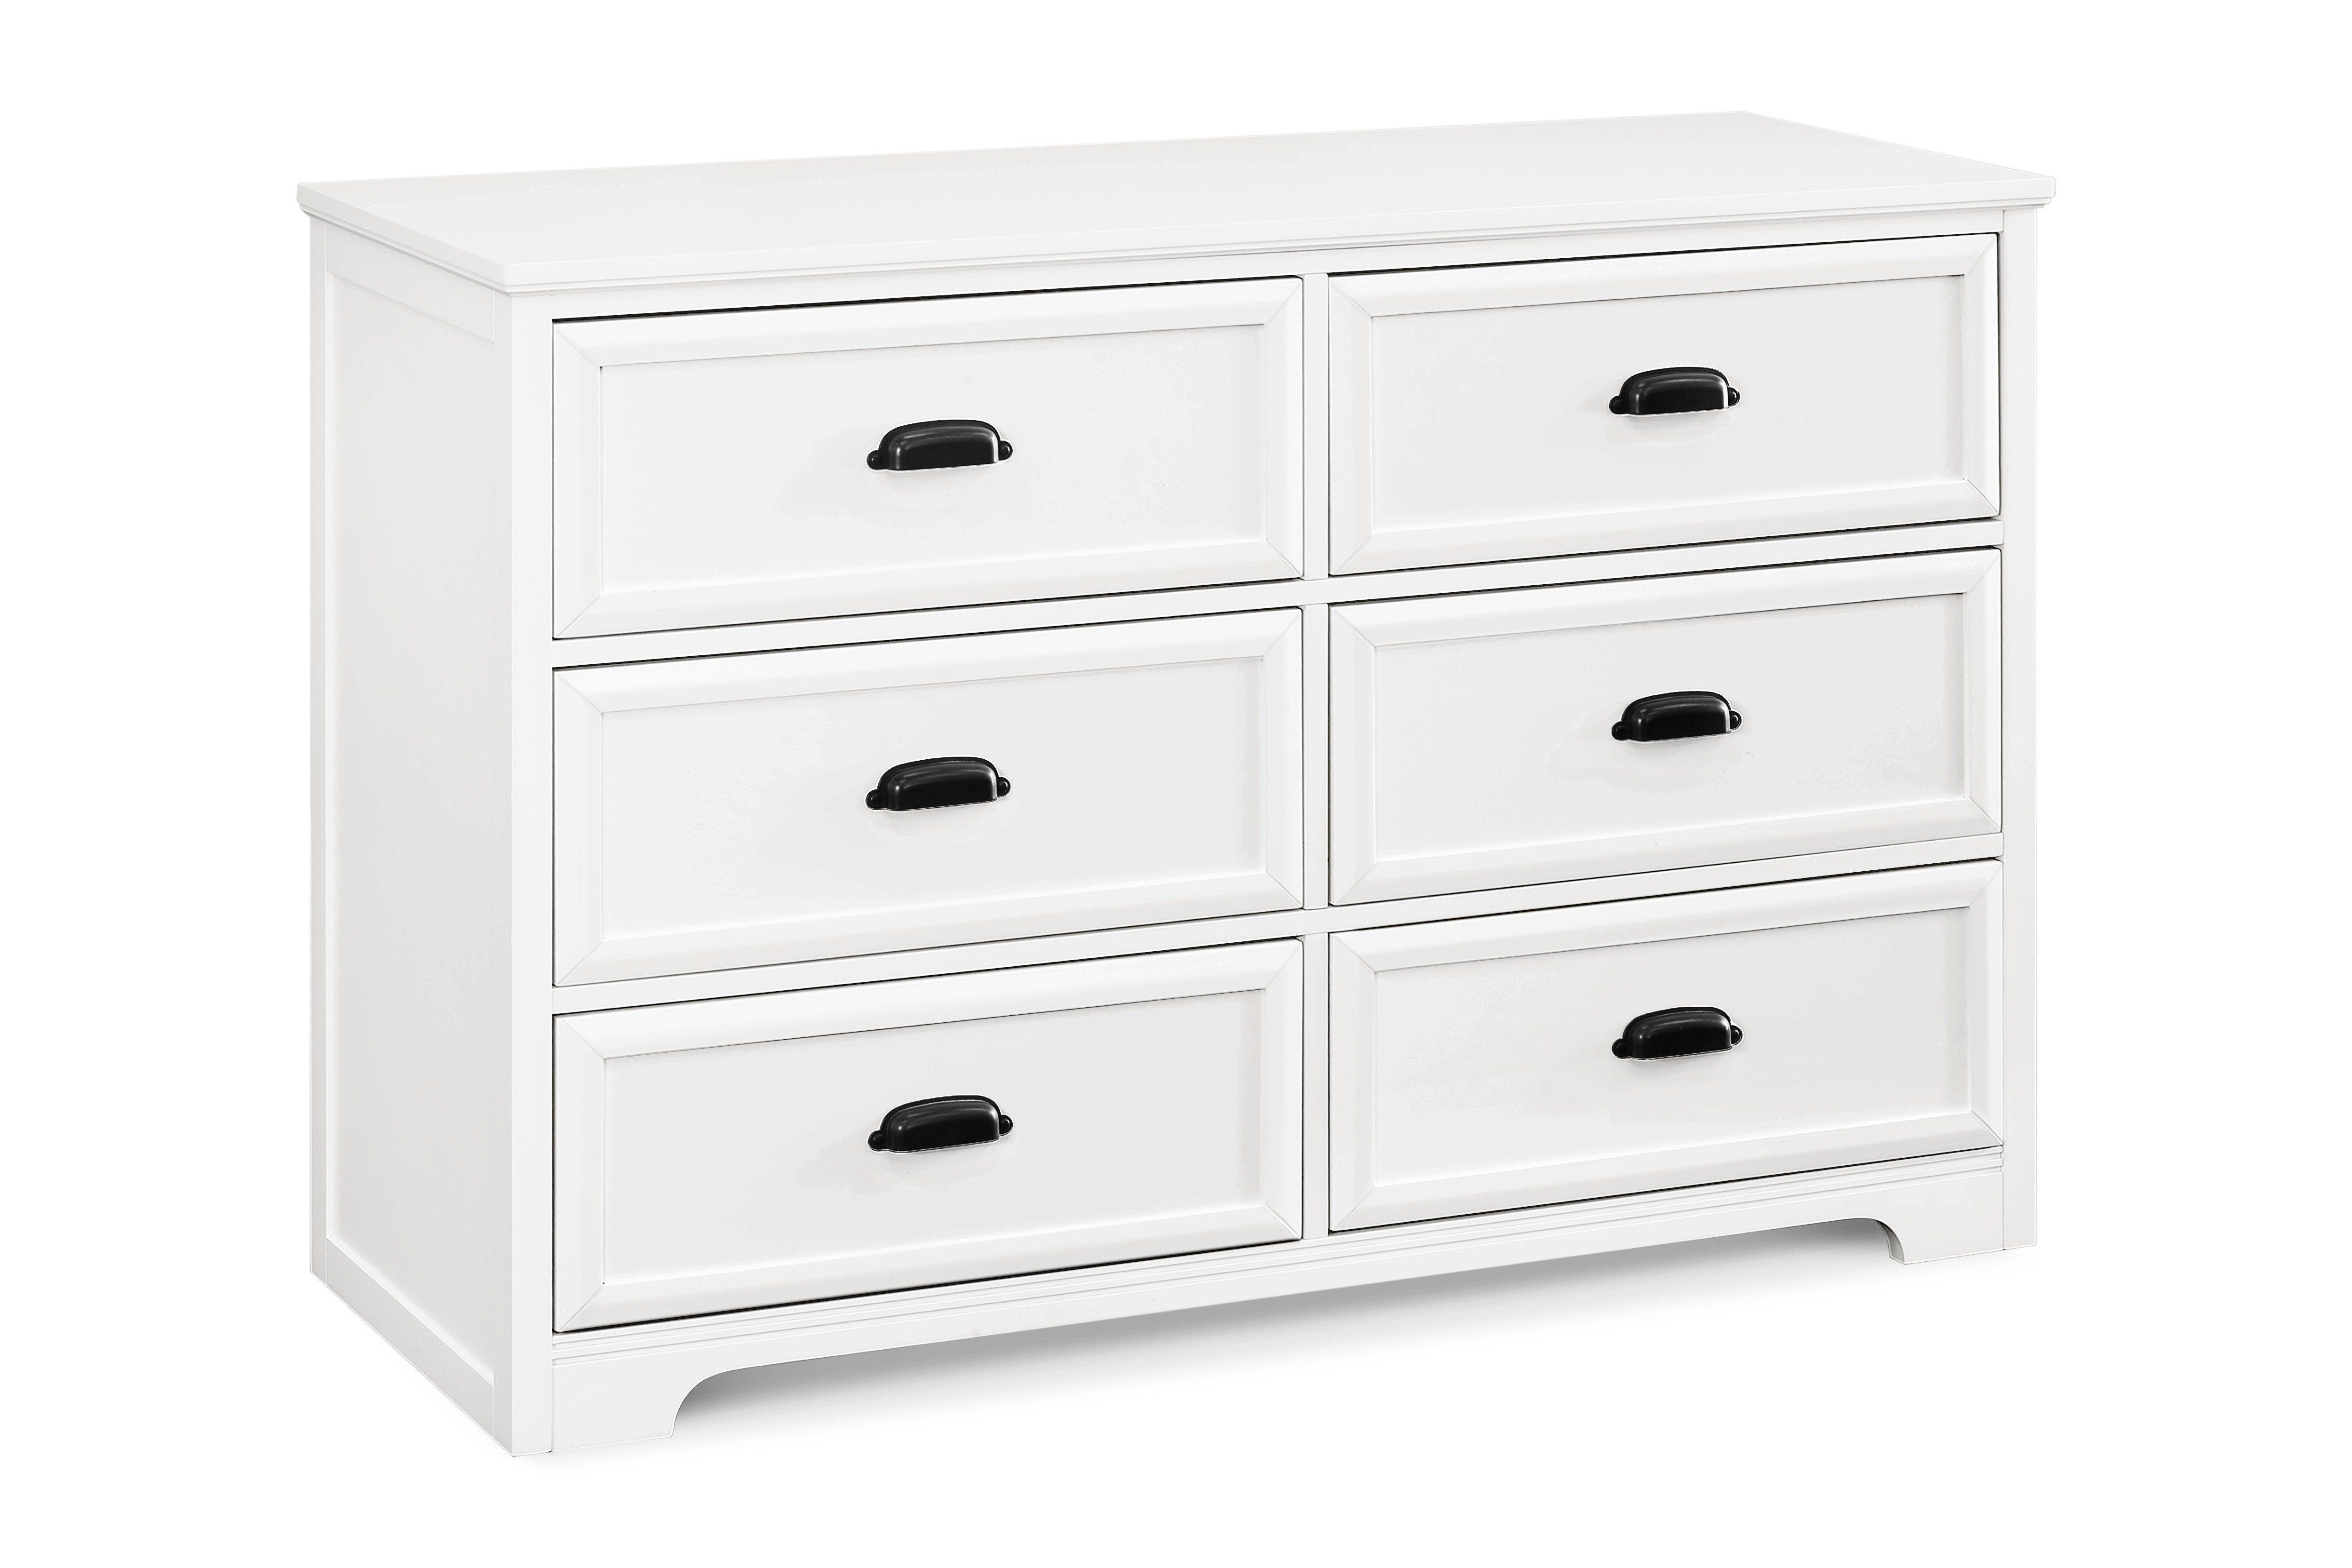 Homestead 6 Drawer Double Dresser In 2021 Double Dresser At Home Store Dresser [ 3333 x 5000 Pixel ]